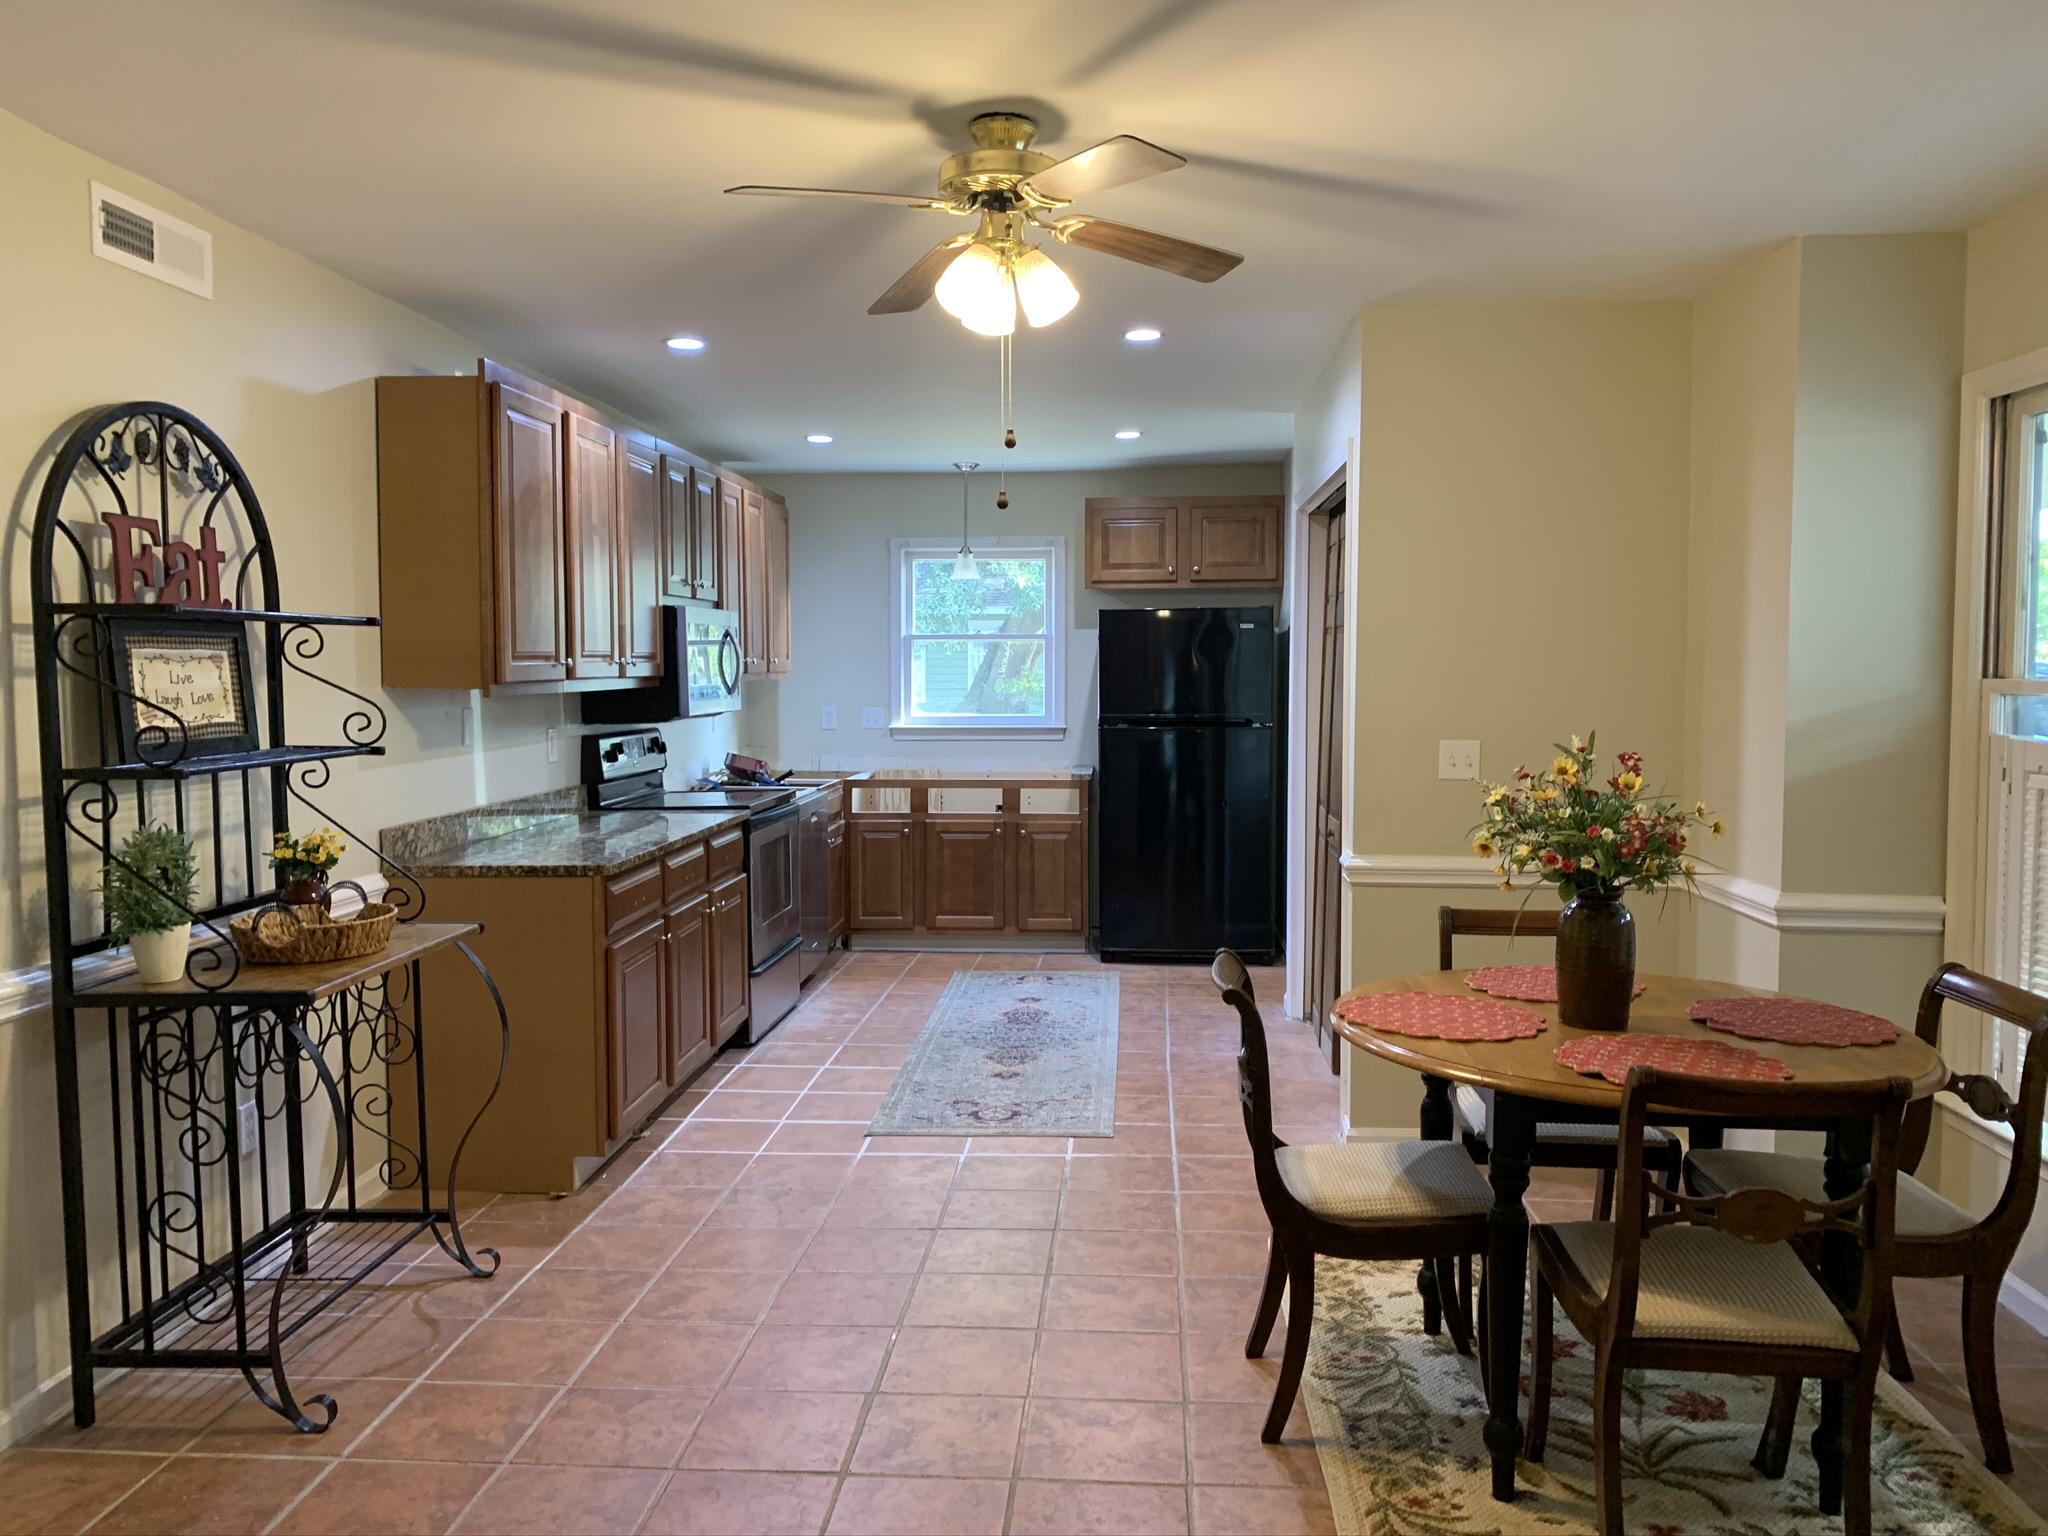 Fox Pond Homes For Sale - 662 Poaug, Mount Pleasant, SC - 7